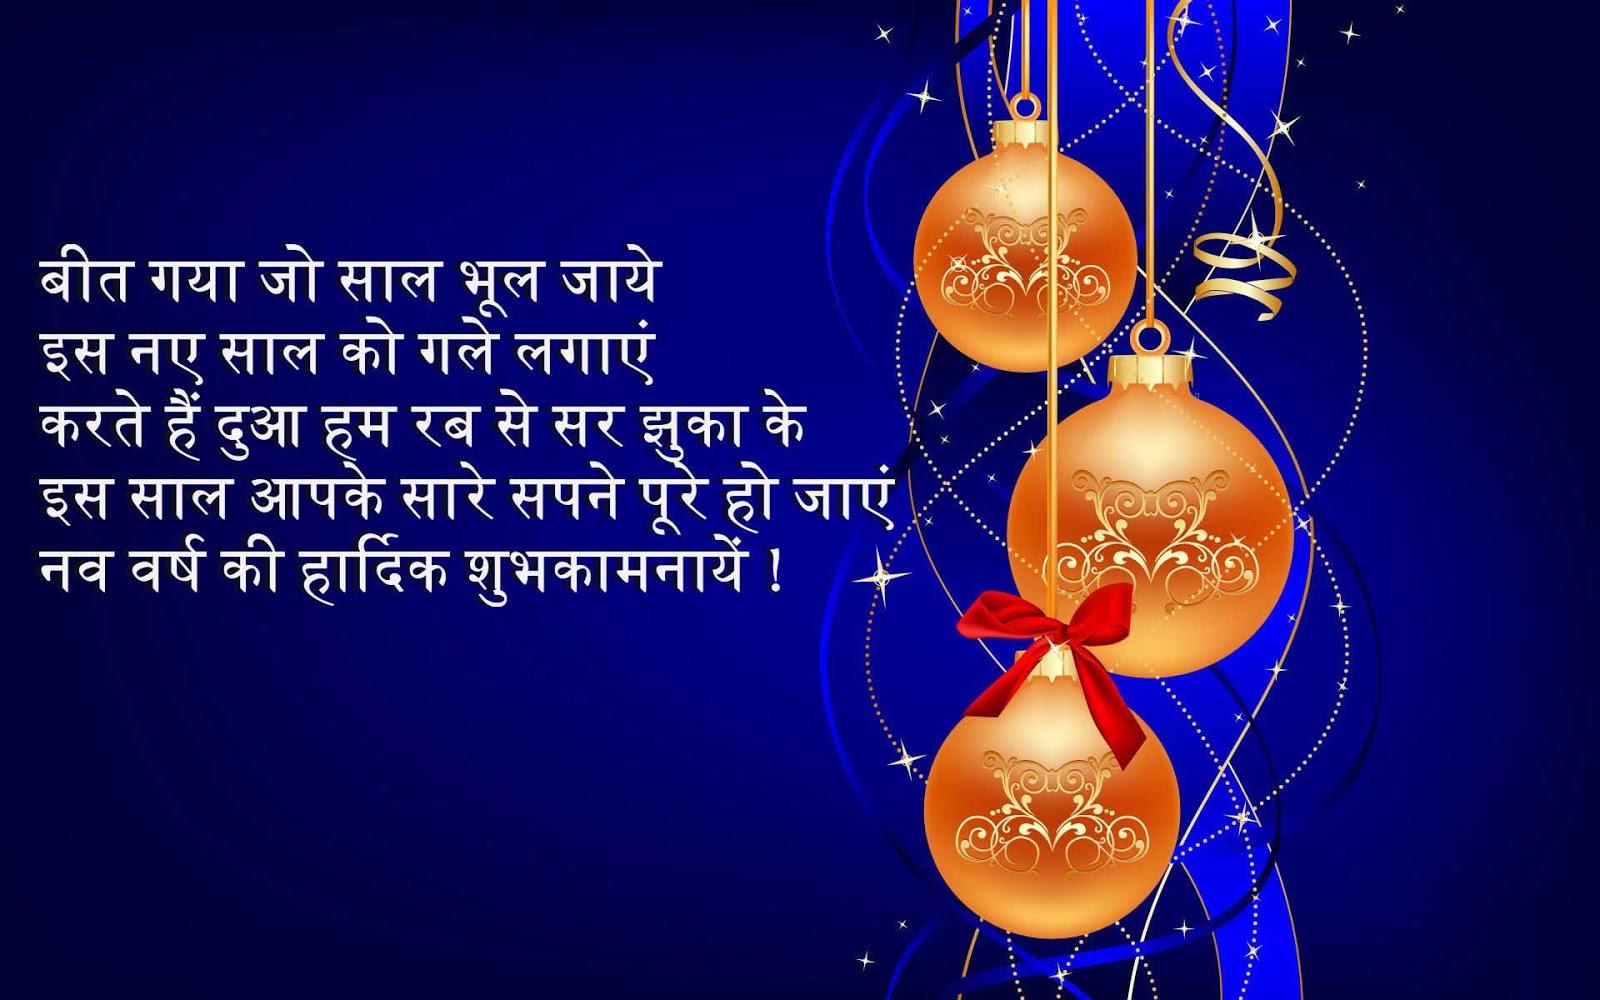 Happy new year wishes in marathi latest marathi shayri wishes happy new year 2018 png image kristyandbryce Gallery